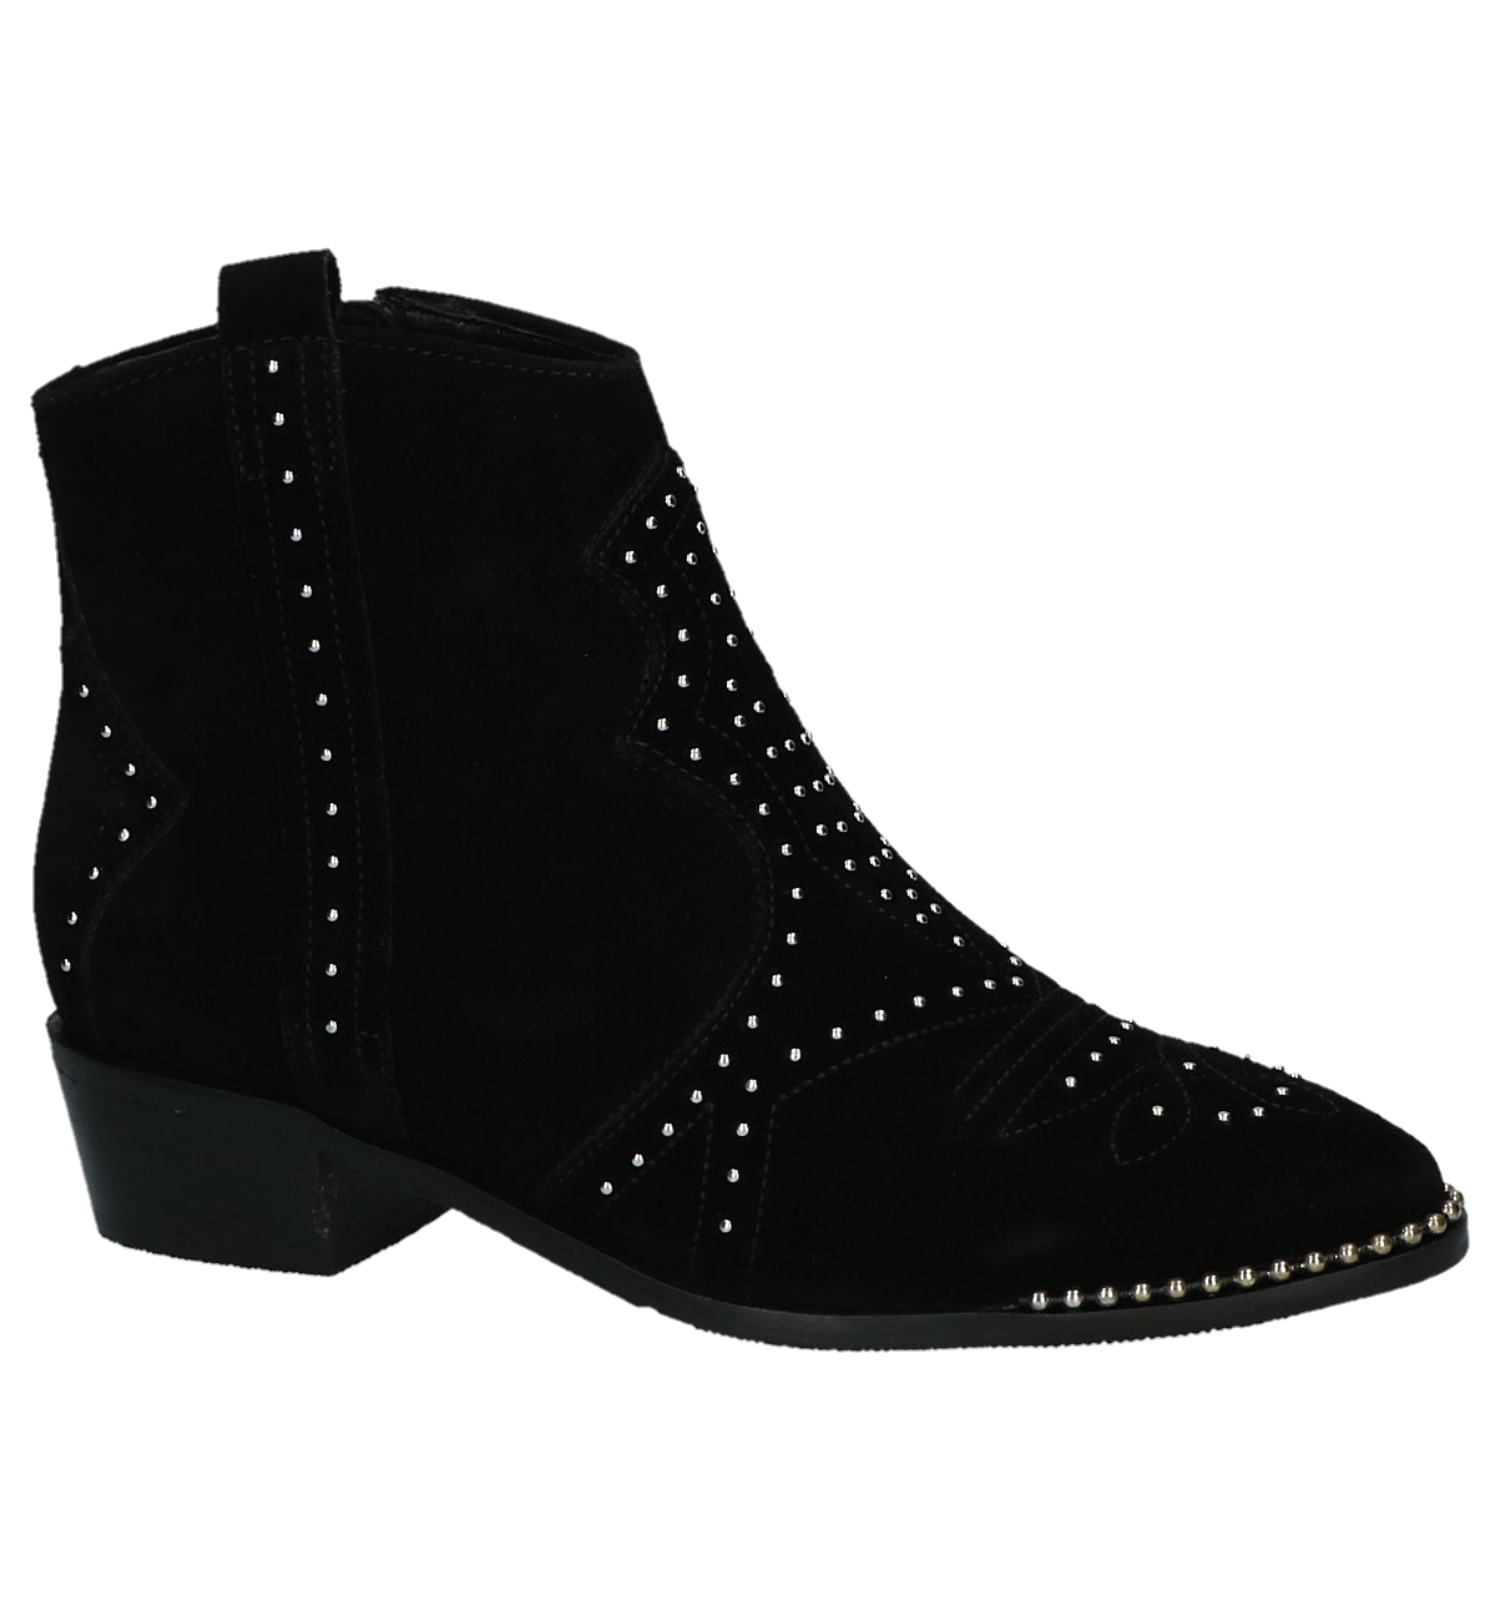 Zwarte Boots met Studs Bronx | SCHOENENTORFS.NL | Gratis verzend en retour